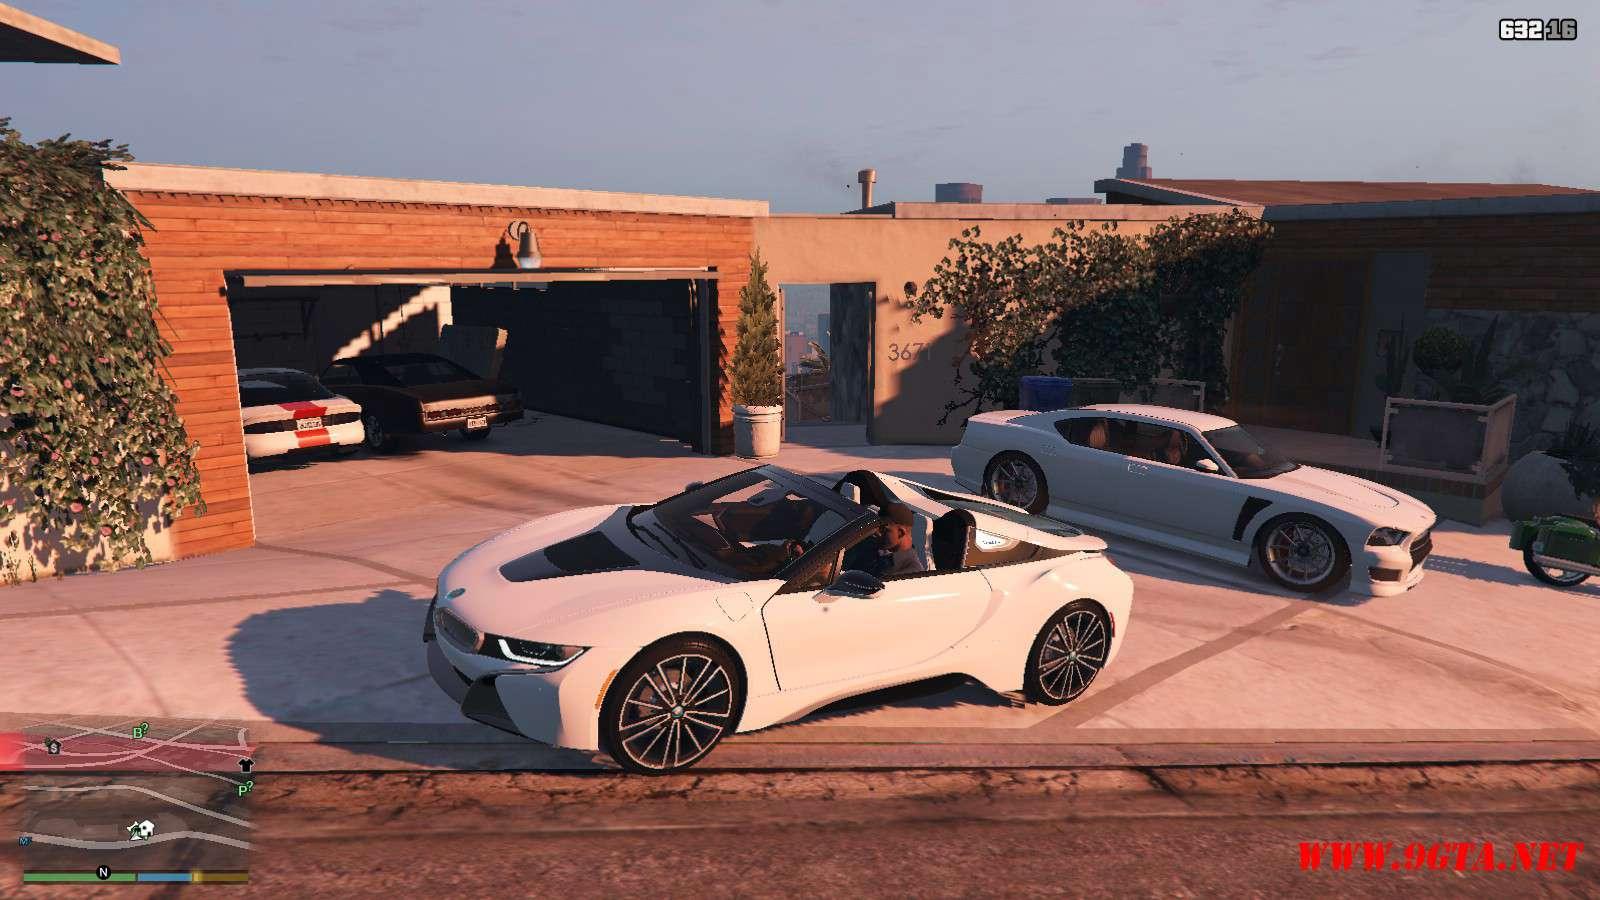 2019 BMW I8 Roadster GTA5 Mods (9)